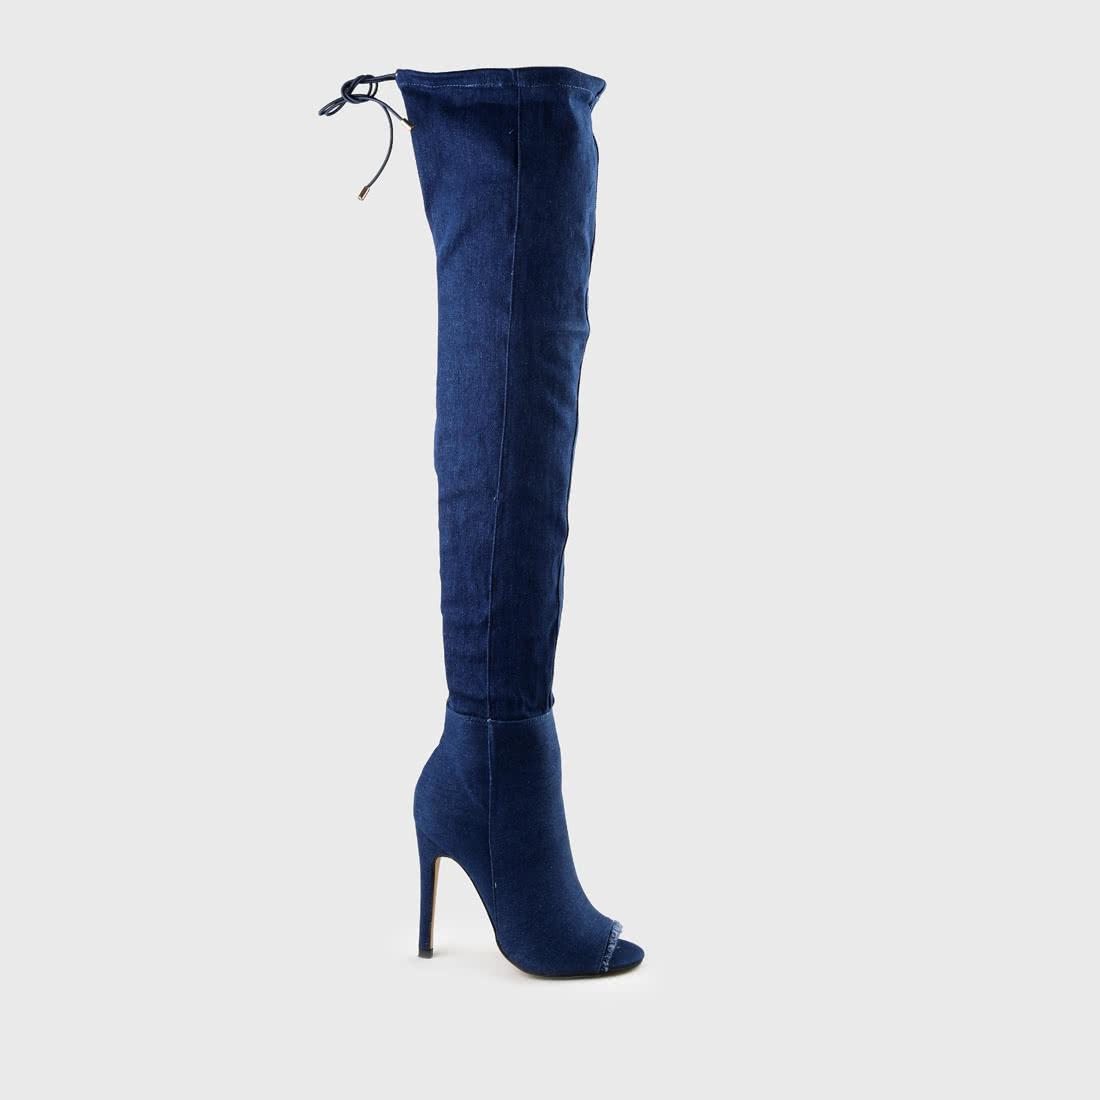 6e9a6cb916114 Bufflao Overknee-Stiefel in jeansblau